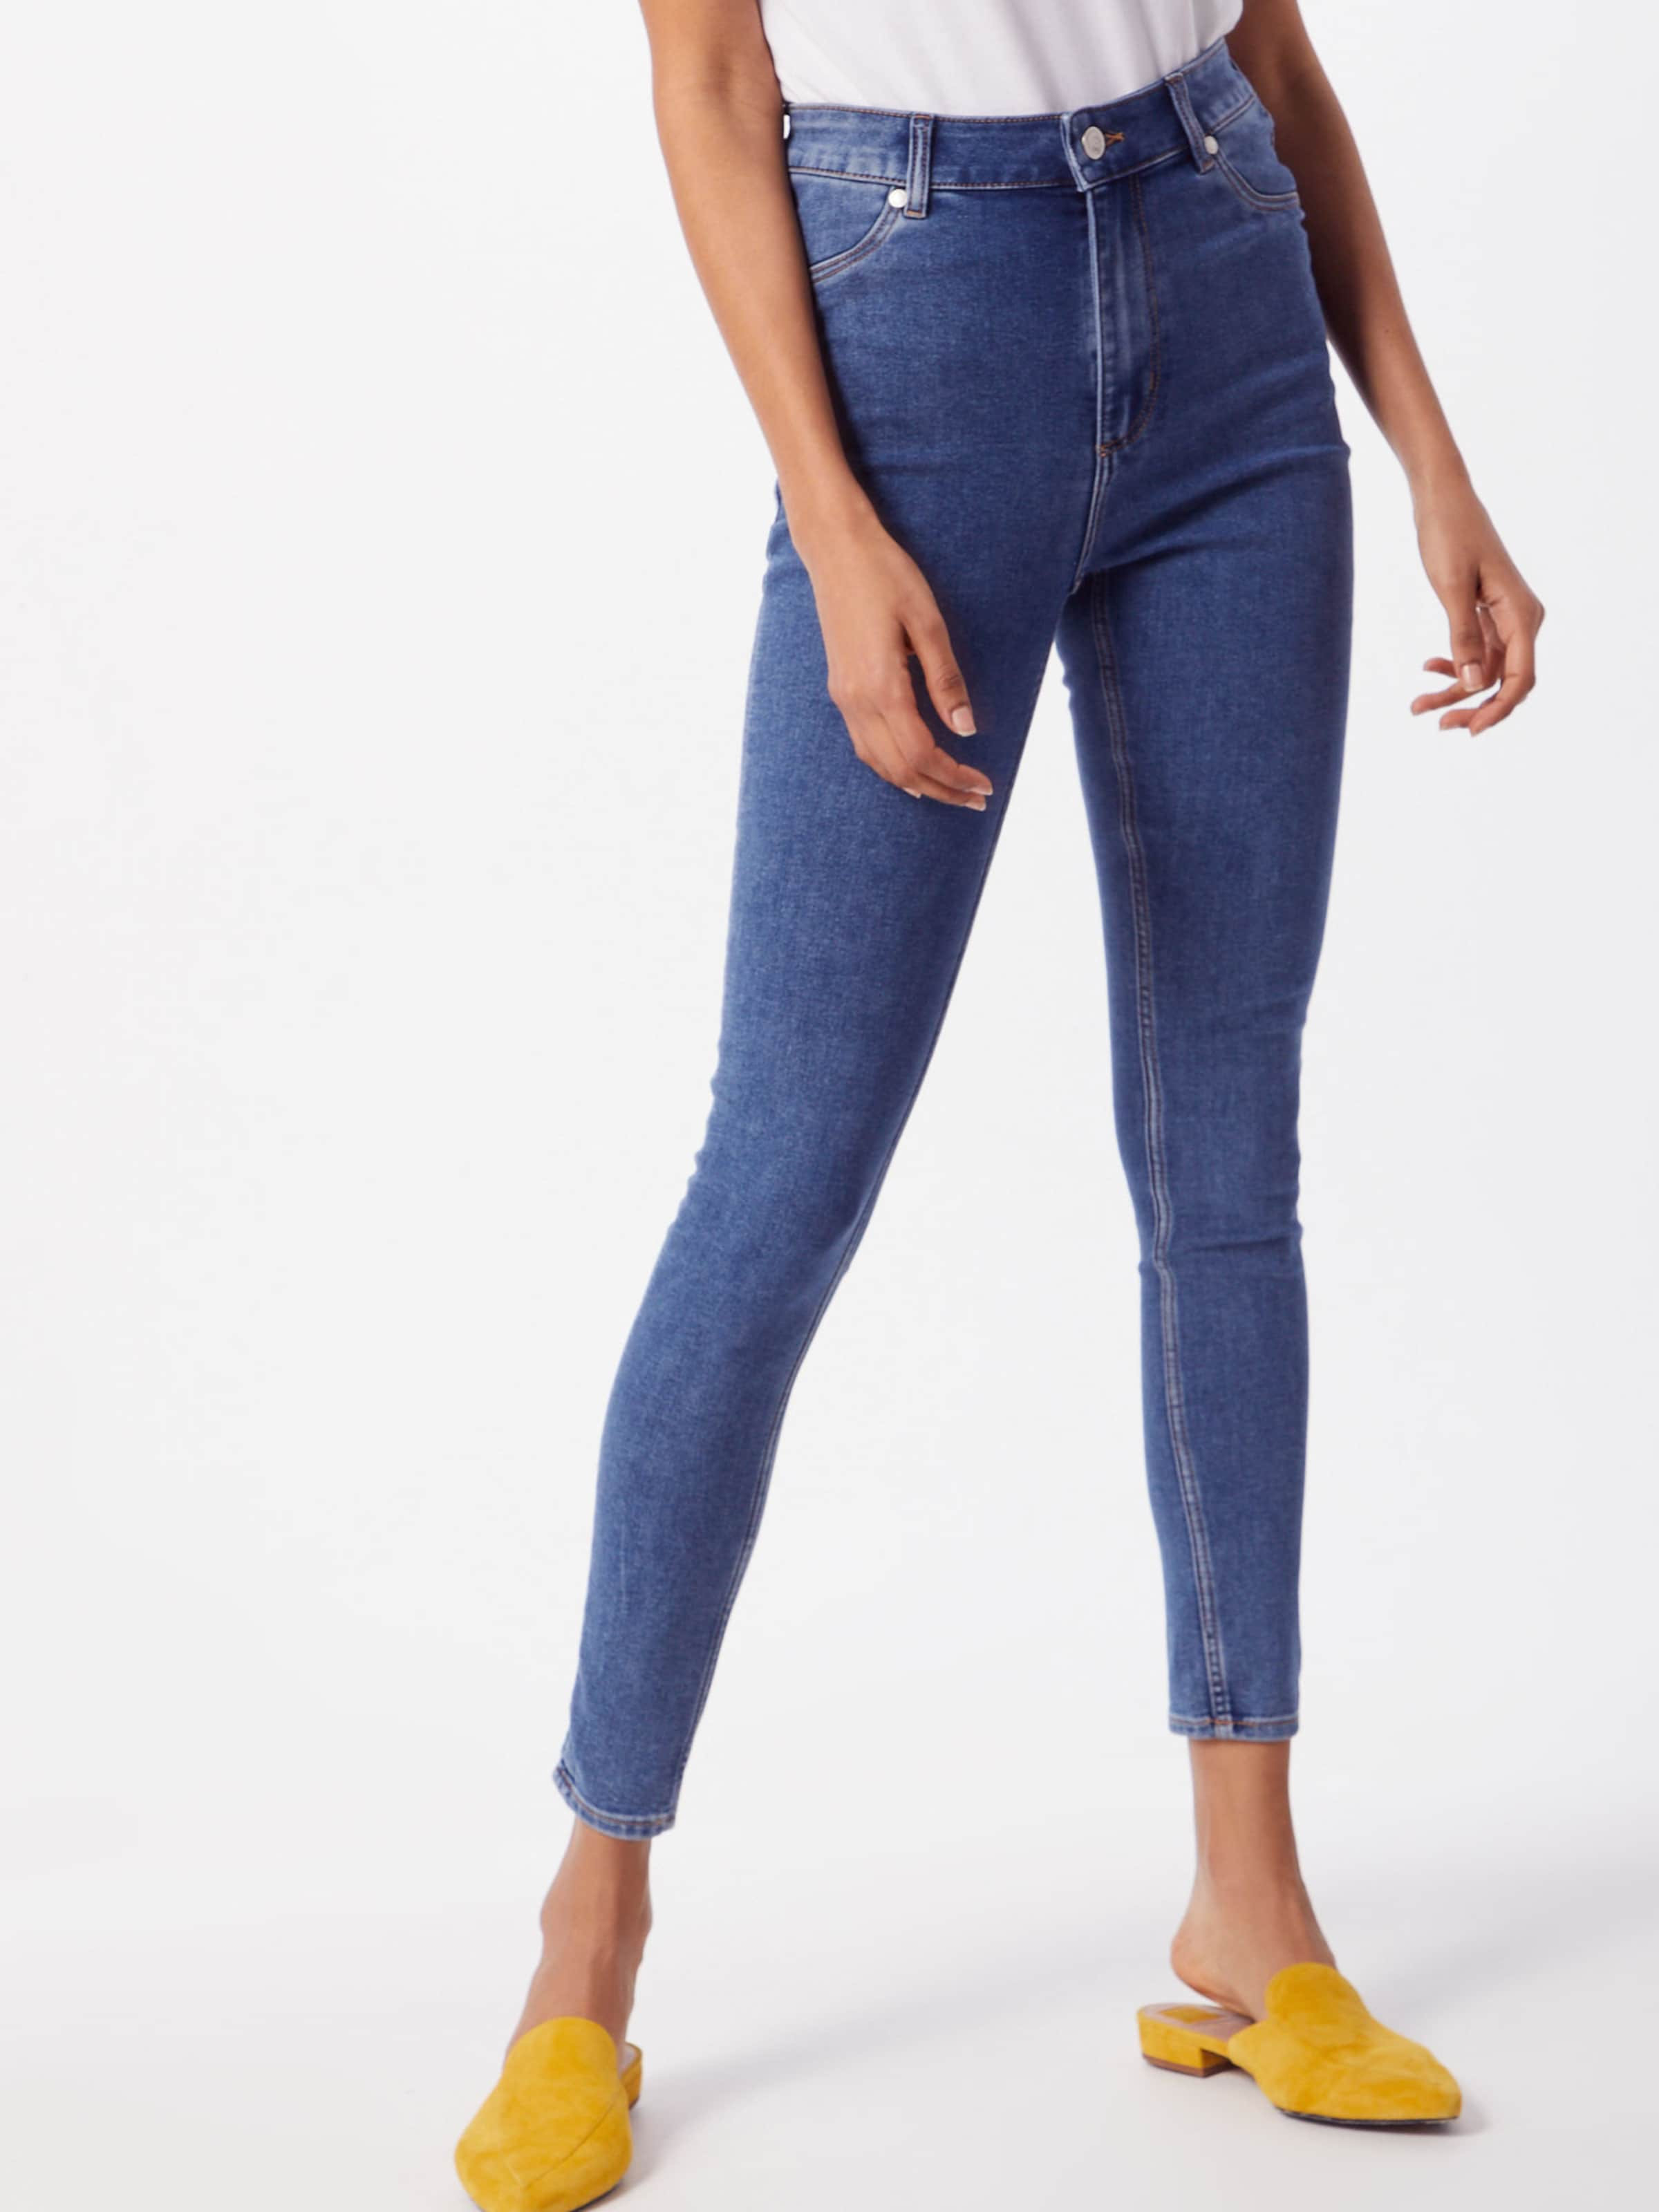 Blue Cheap In Jeans Denim Monday DW9IYE2H